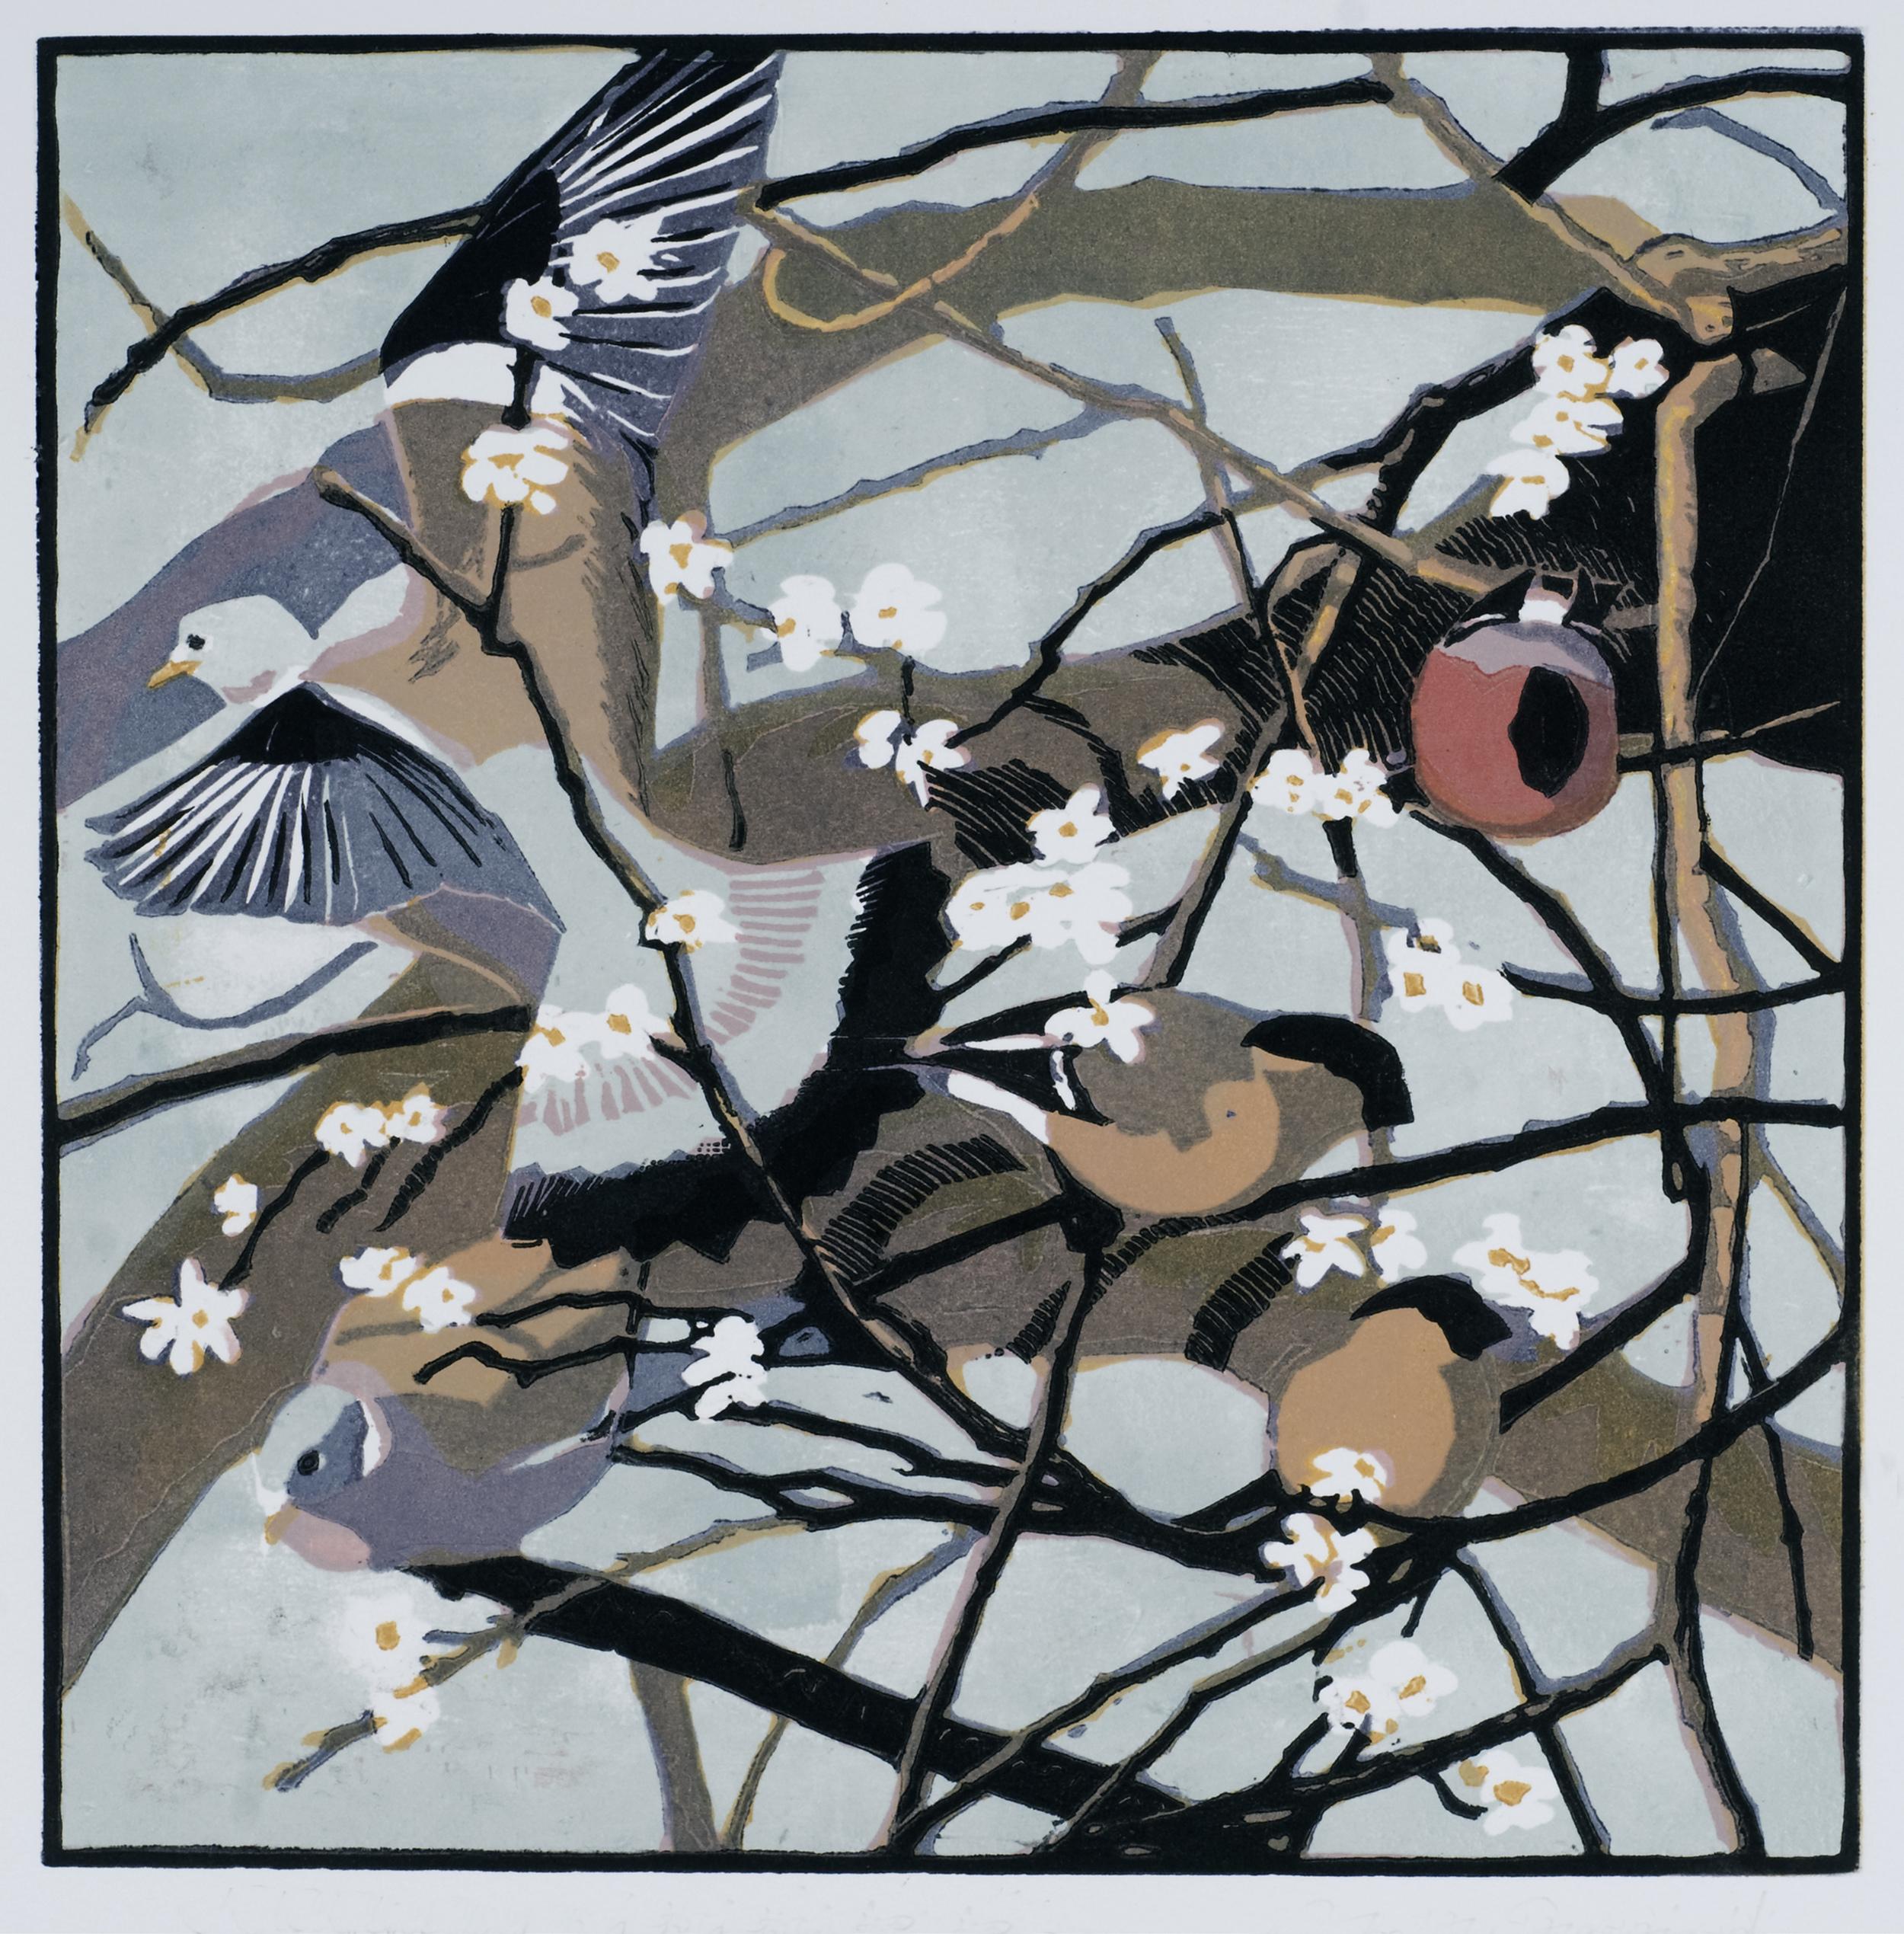 Bullfinches and Woodpigeons   woodcut   29 x 29 cm  £95